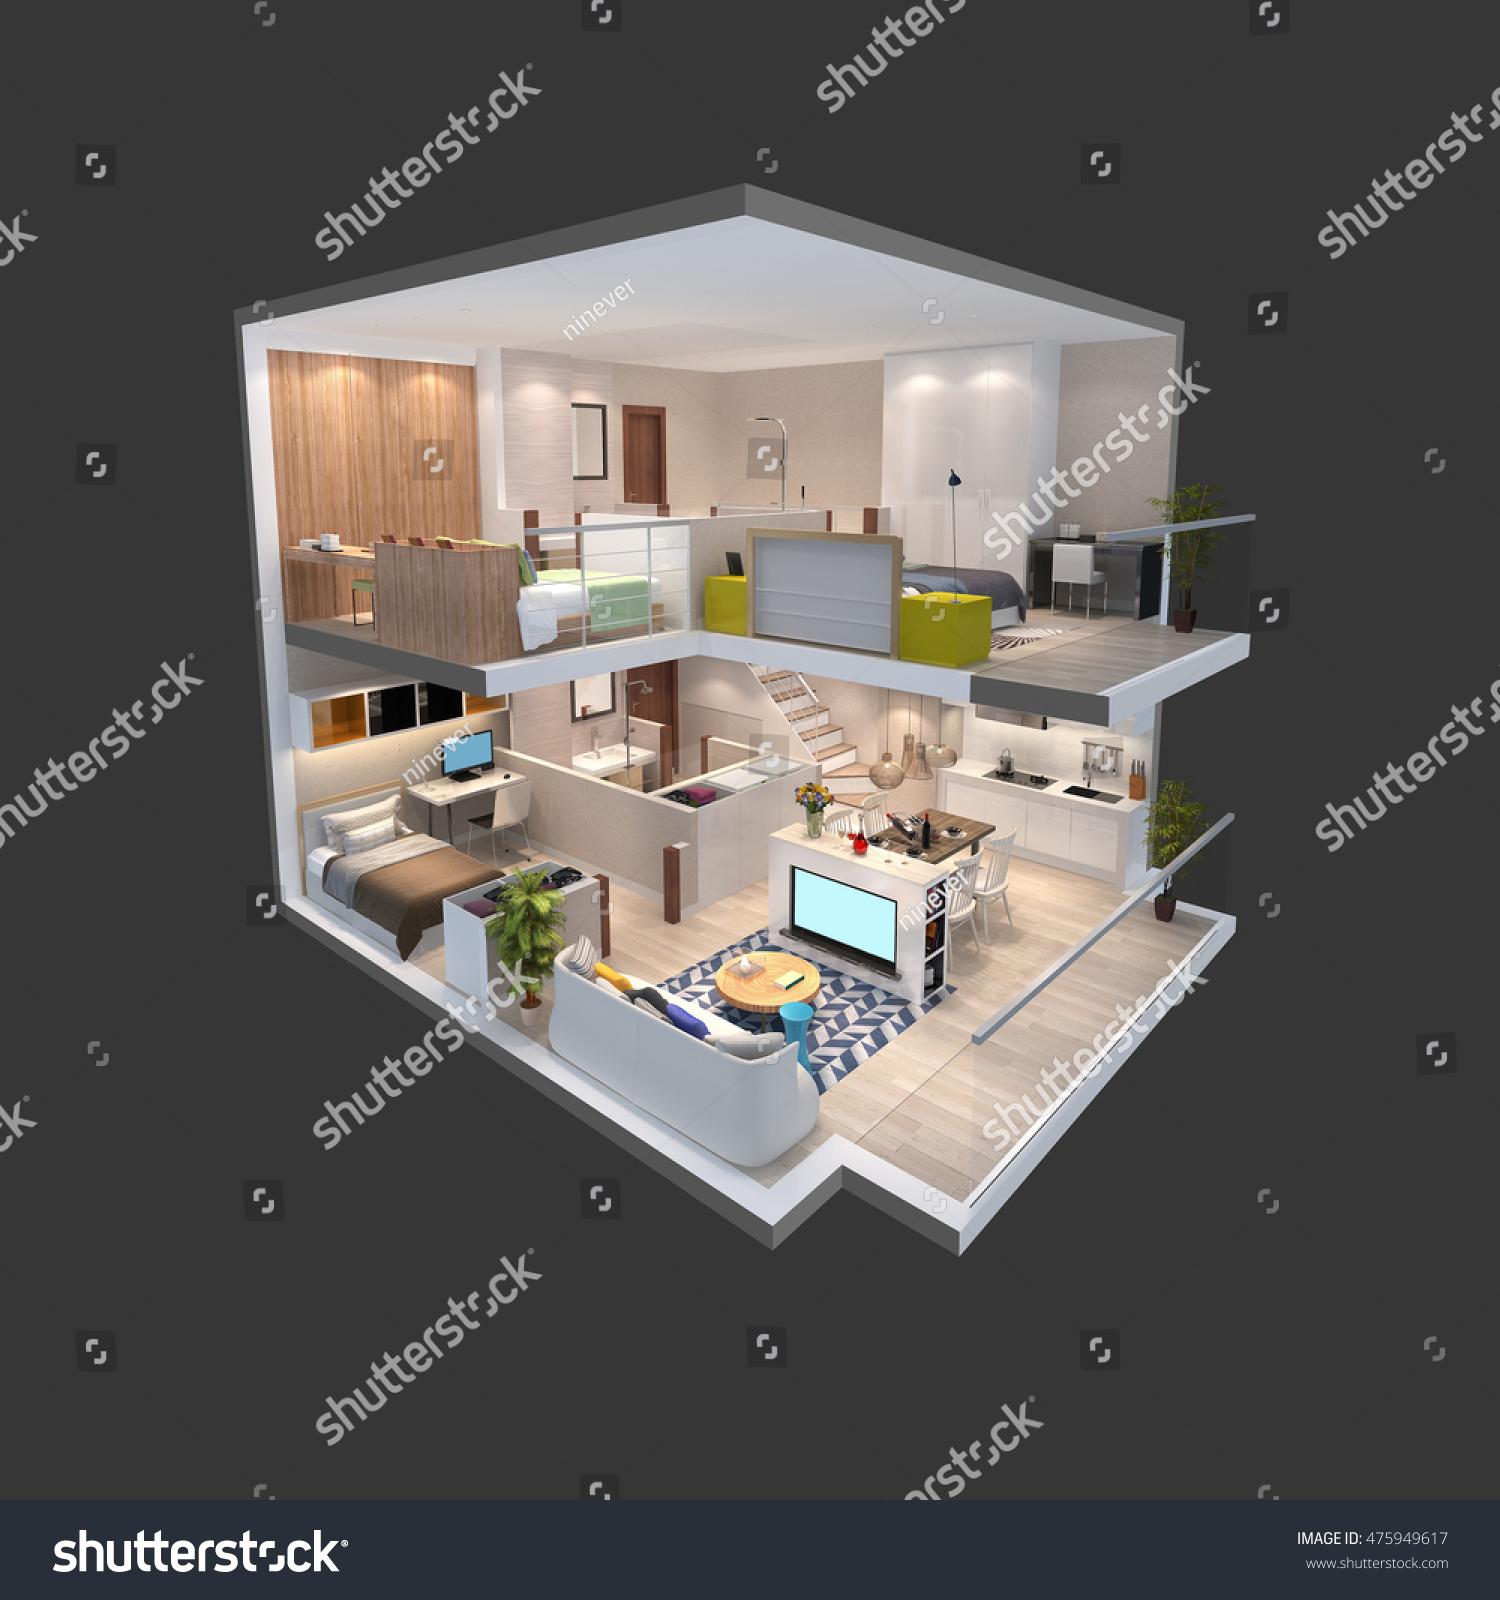 3d Floor Plan Isometric: 3d Illustration Penthouse Isometric Plan Stock